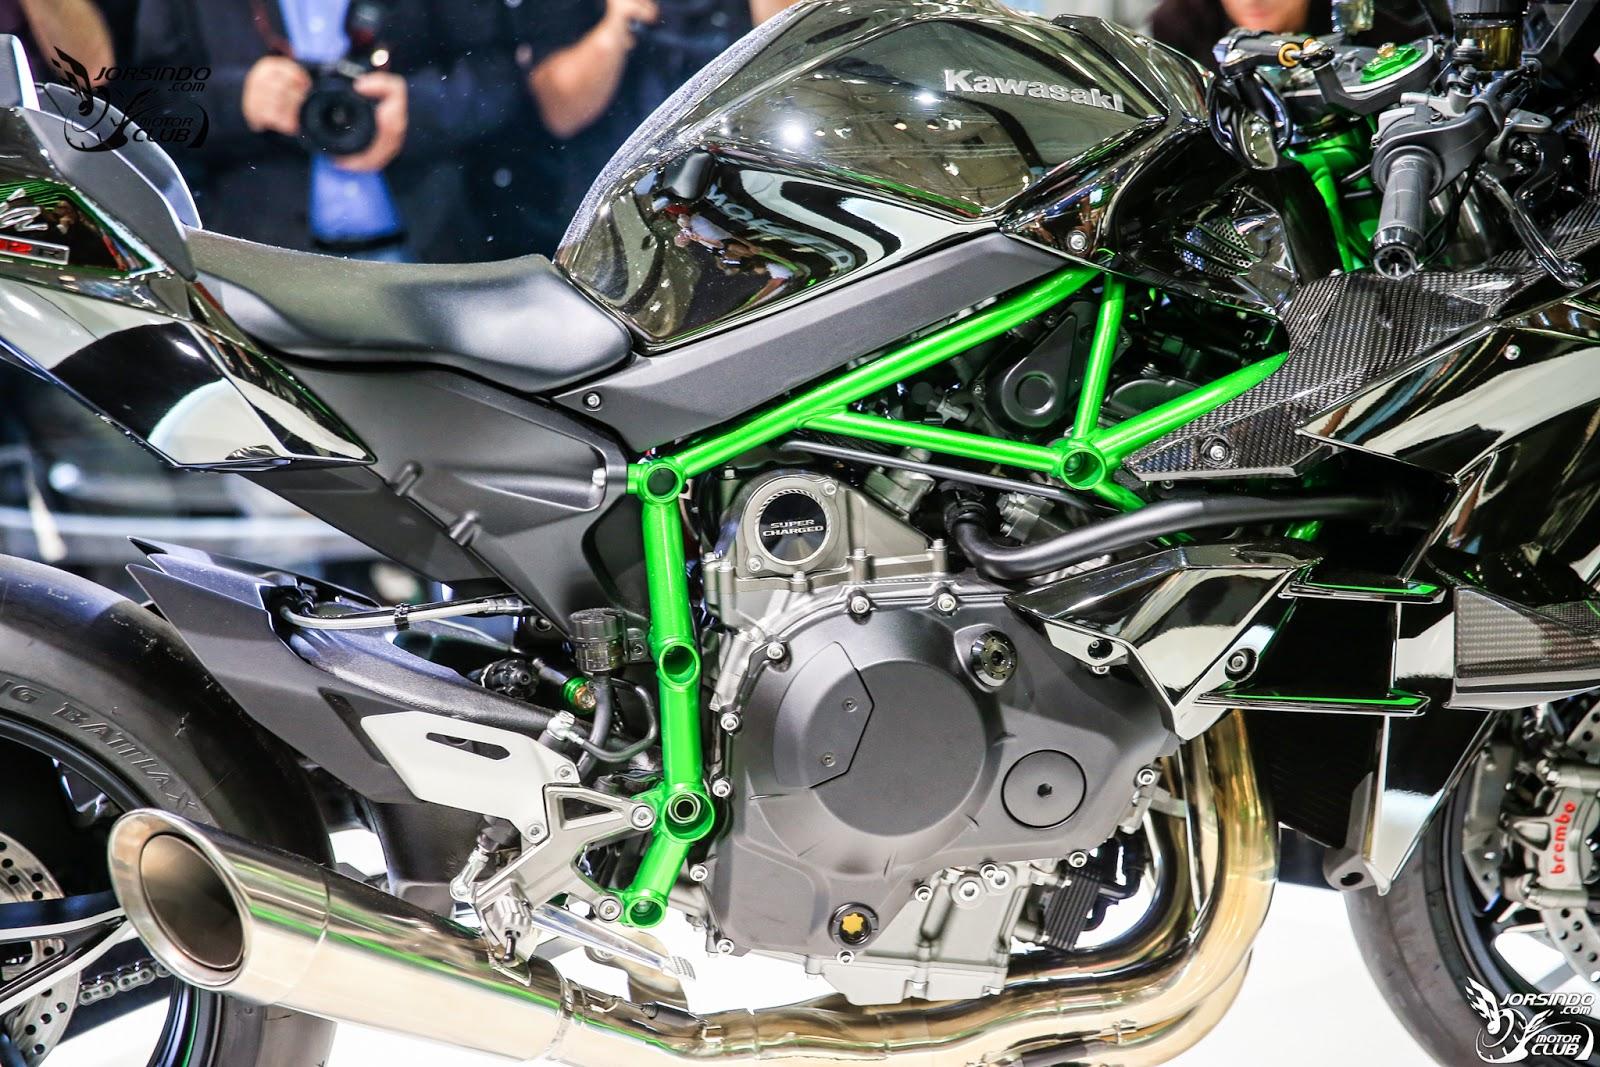 Kawasaki Ninja H2R Malaysia